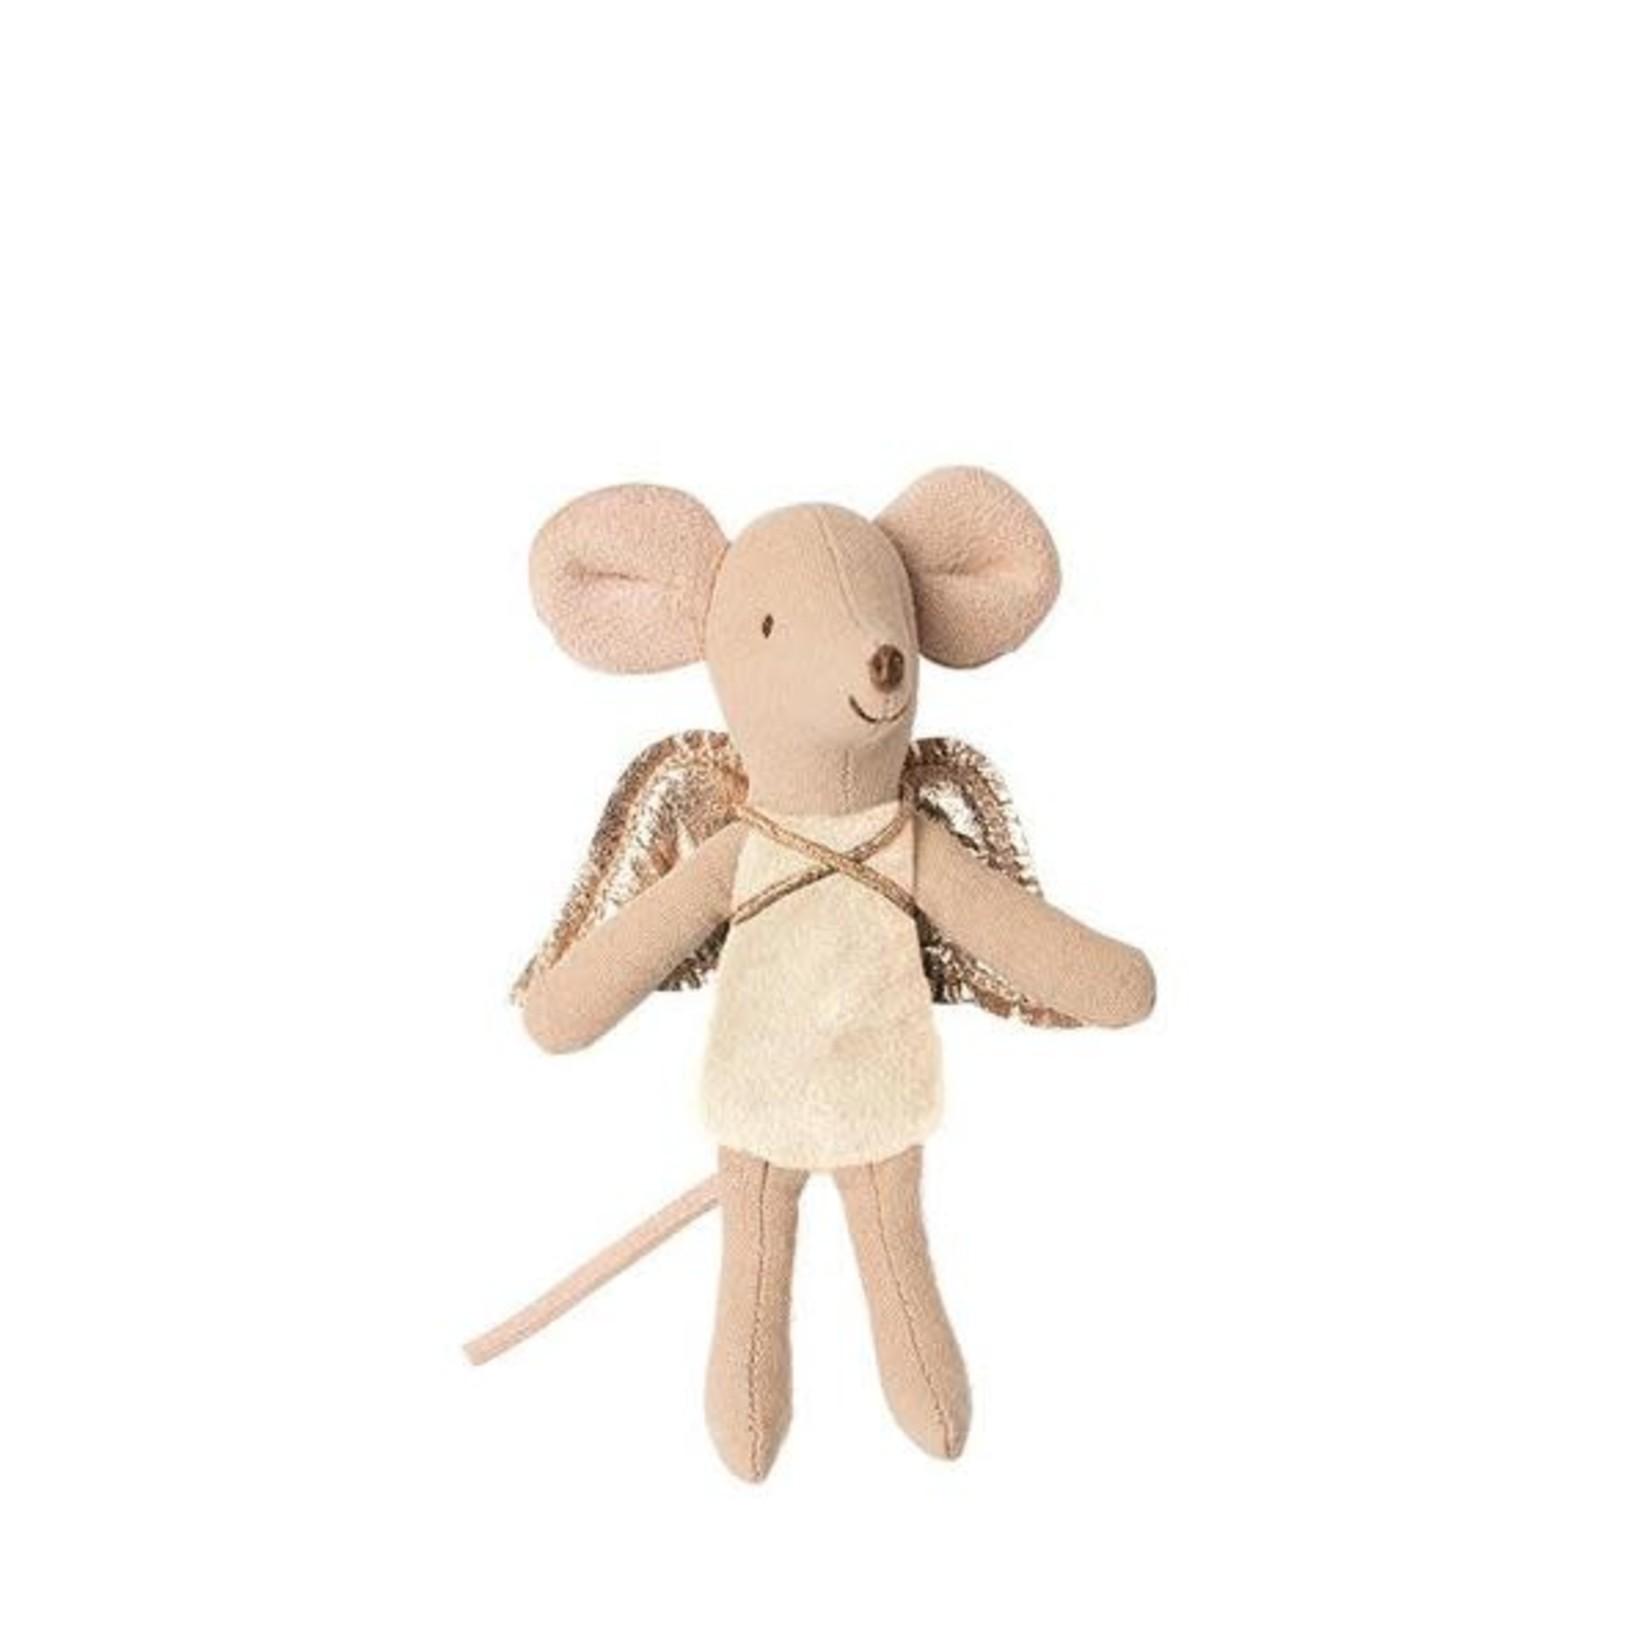 Maileg Fairy Little Sister Mouse - Cream